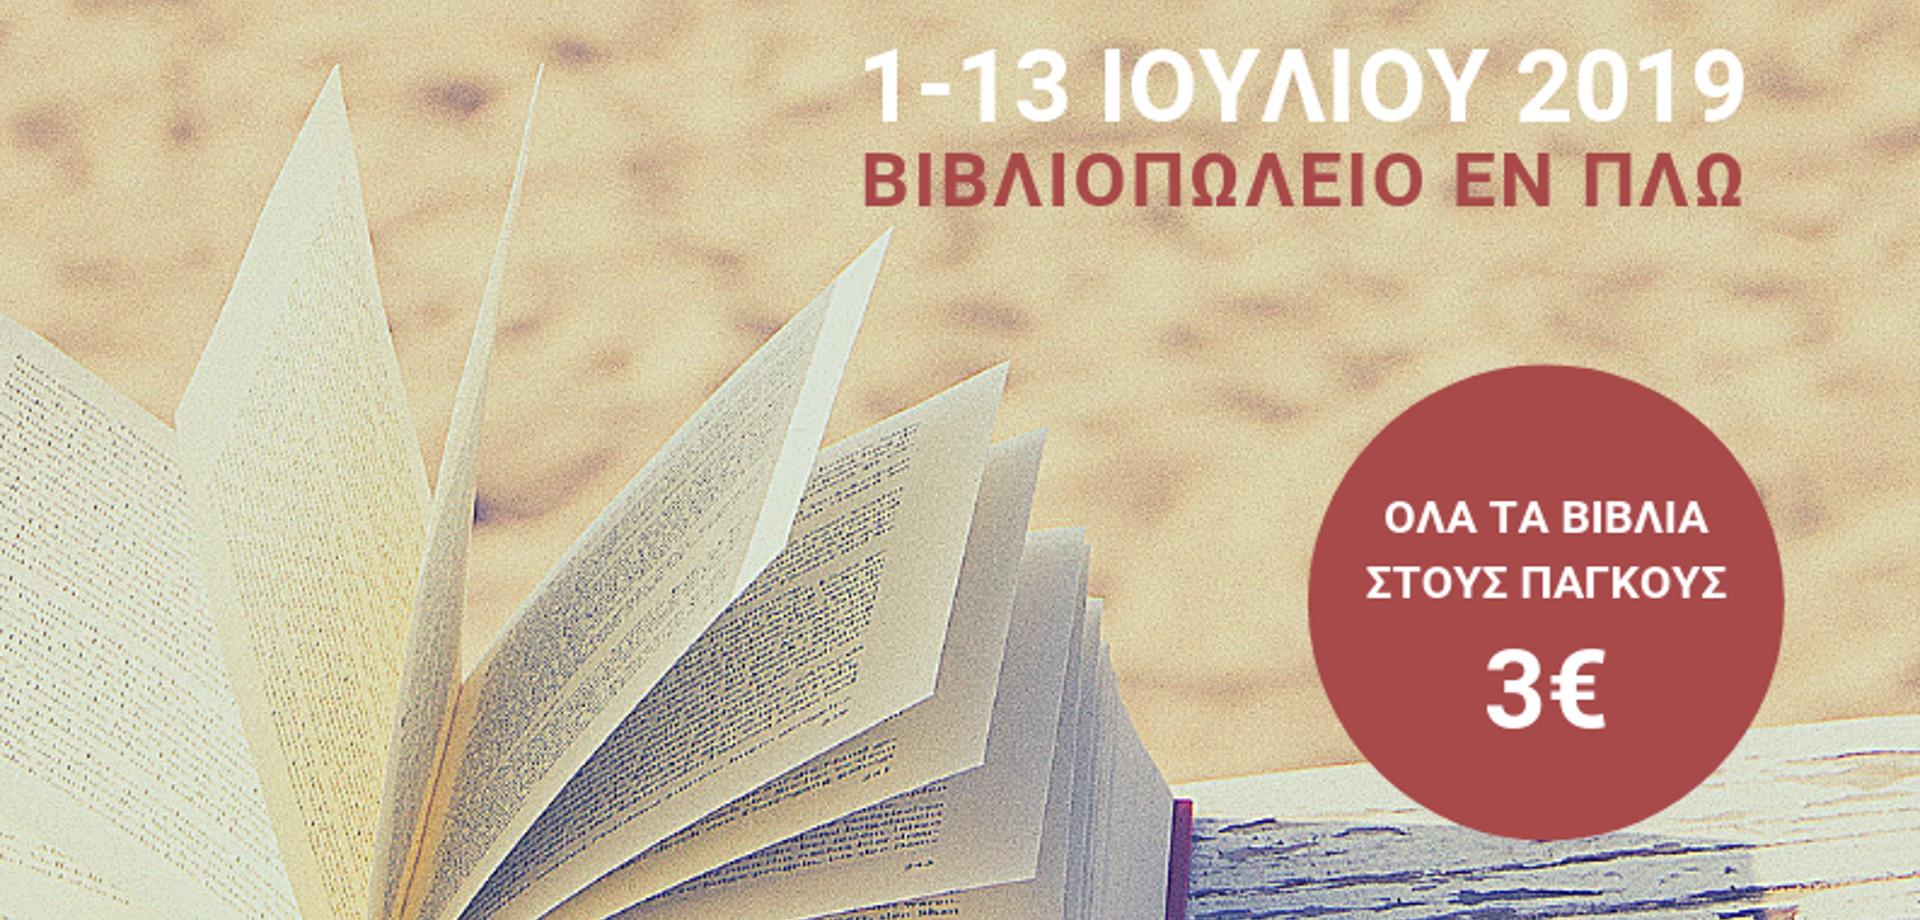 d03408a8c11 Μεγάλο θερινό Bazaar βιβλίου για καλό σκοπό στο Βιβλιοπωλείο Εν Πλω ...